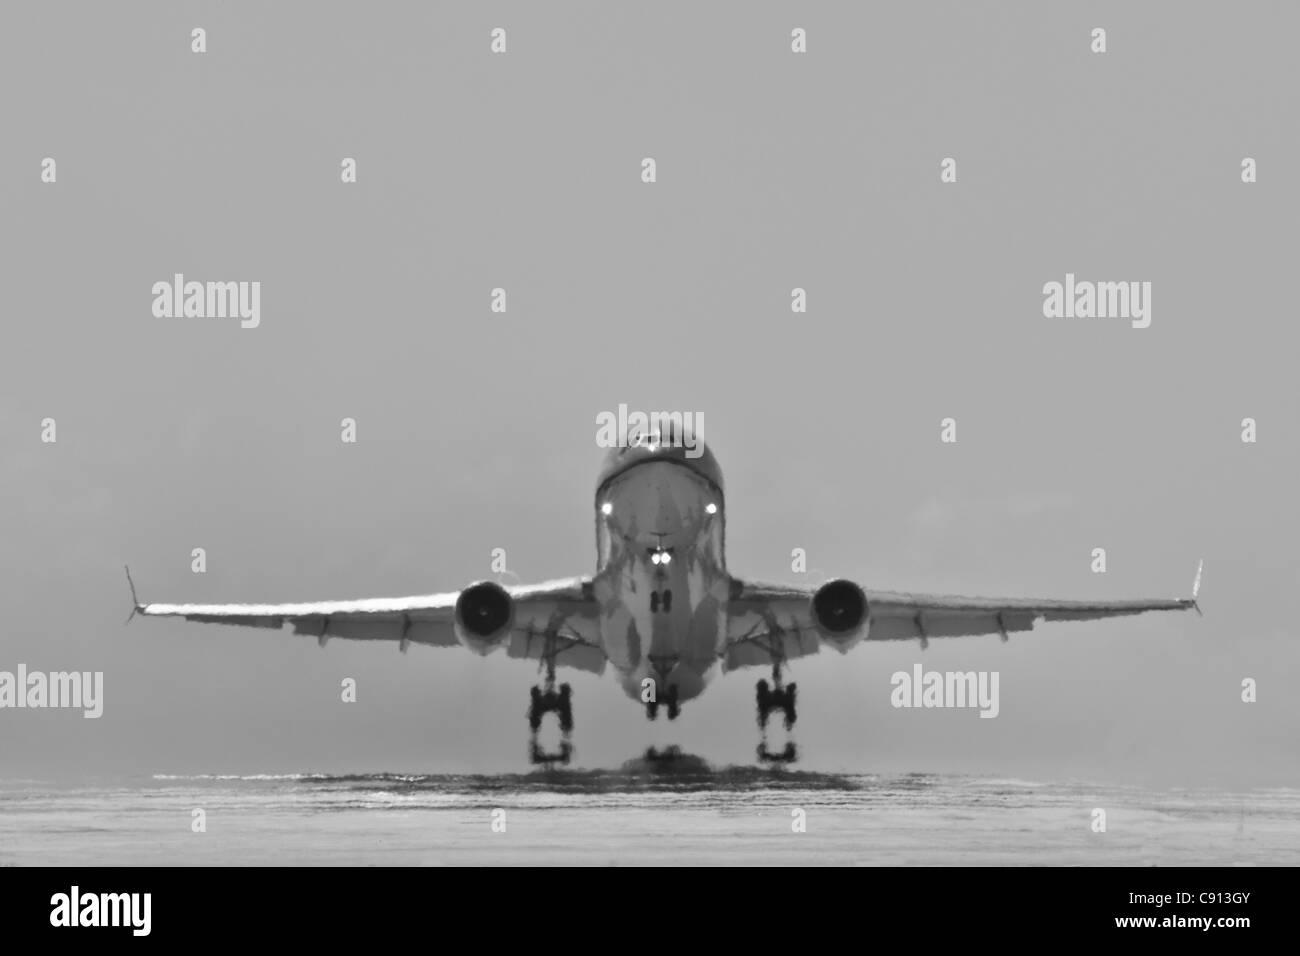 Insel Bonaire, Niederländische Karibik, Kralendijk, KLM Douglas DC-10 Flugzeug abheben von Flamingo Airport. Stockbild